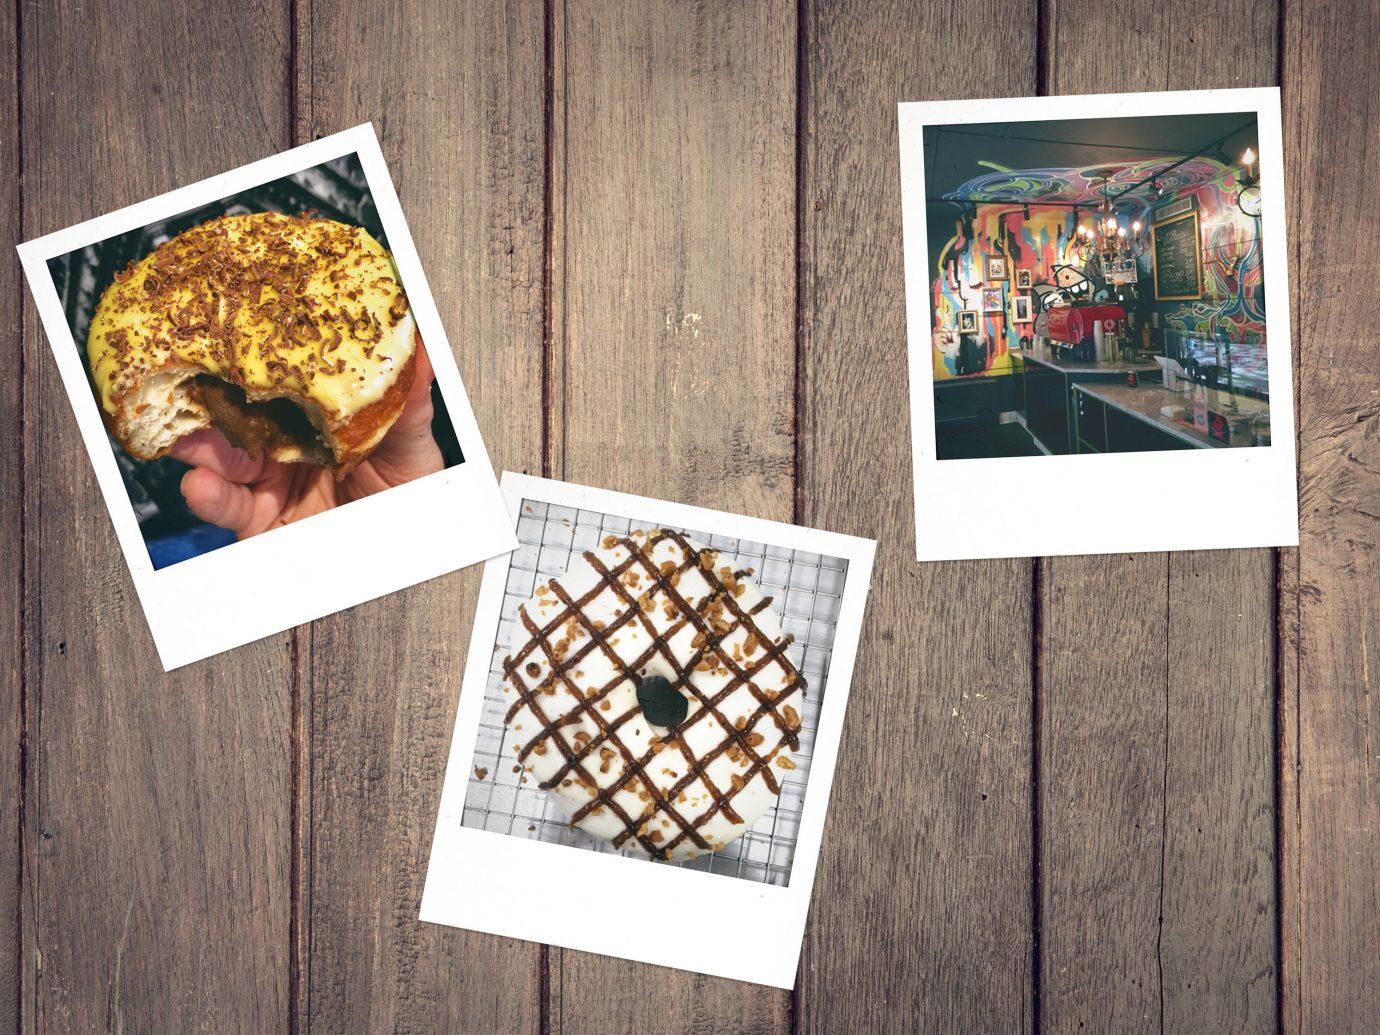 Food + Drink box wooden art wood Design picture frame room